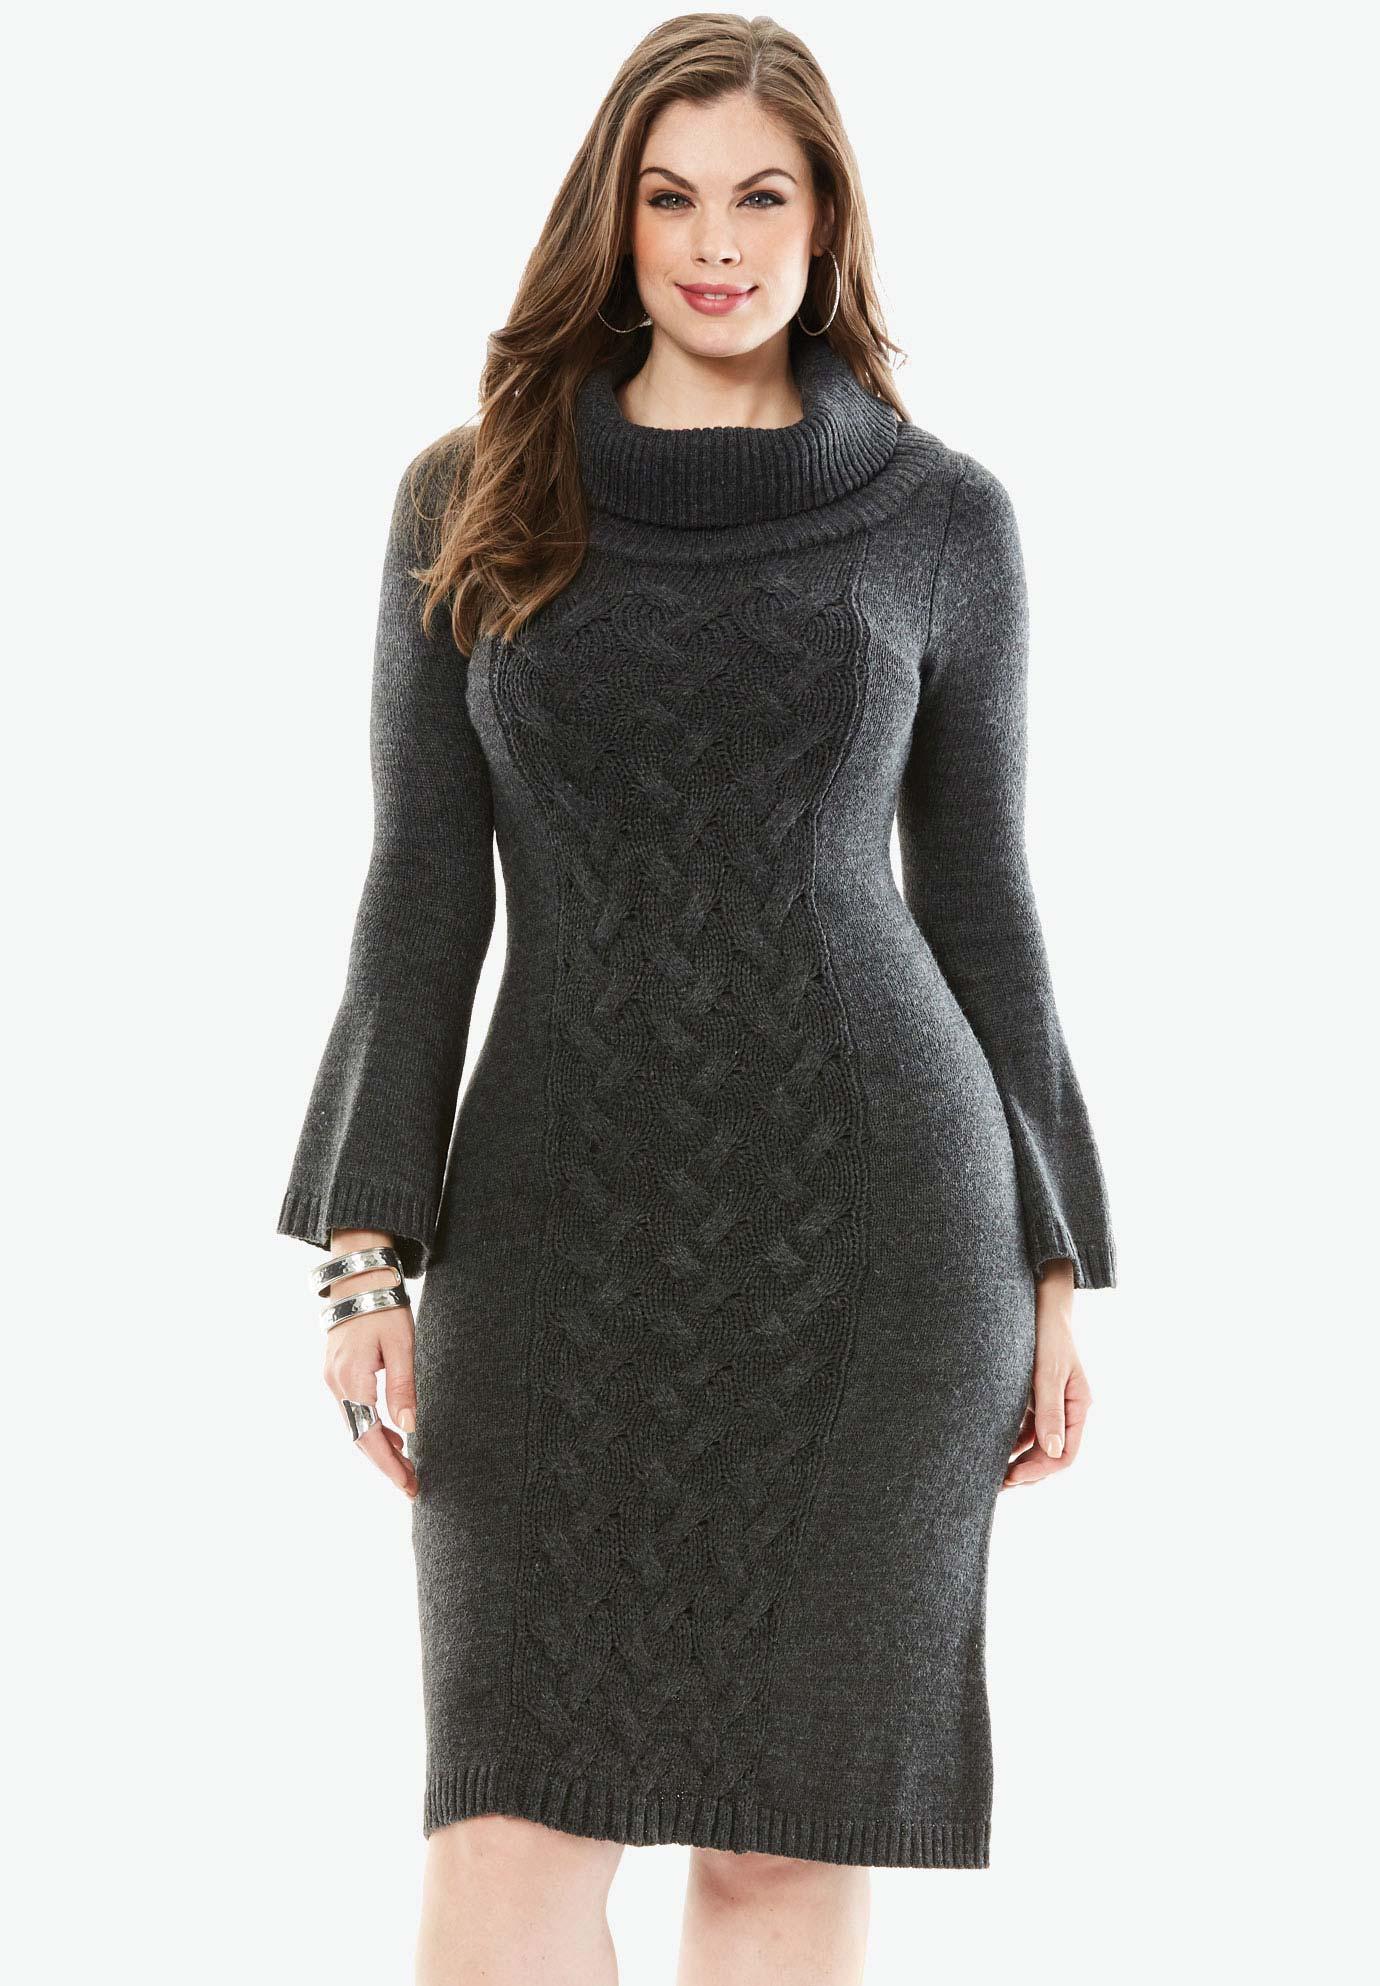 Bell-sleeved Sweater Dress